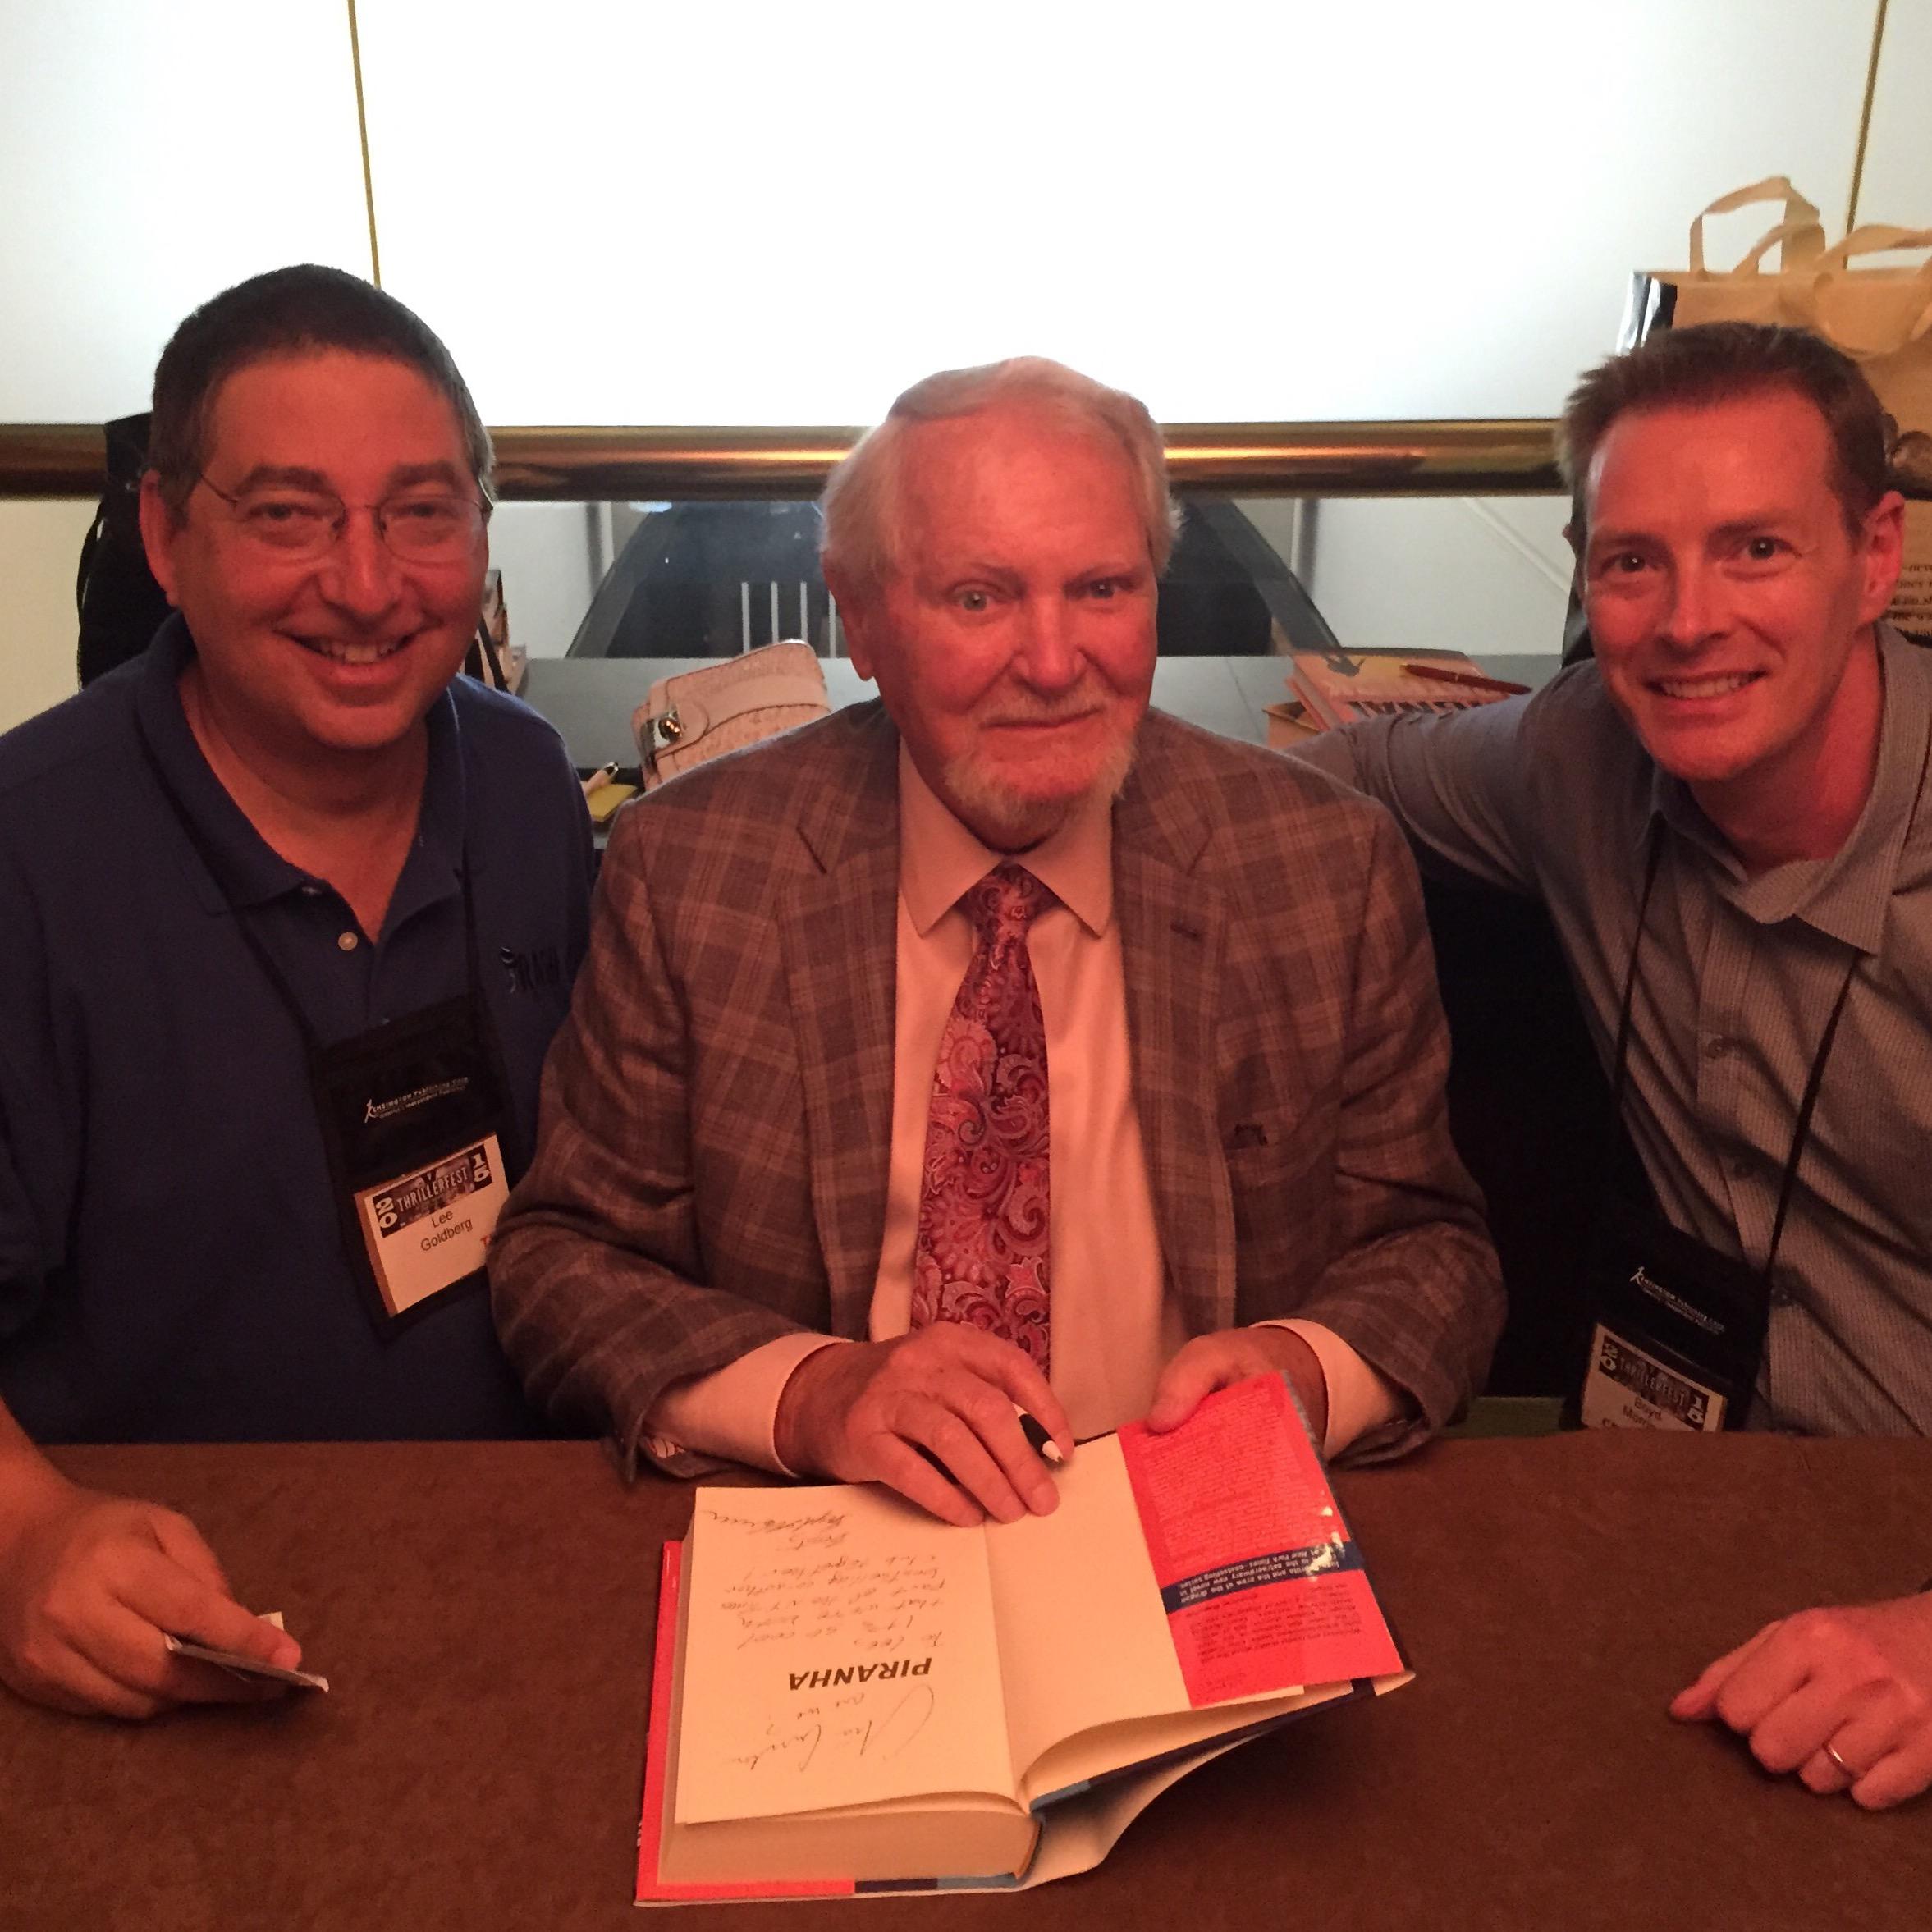 Lee, Clive Cussler, and Boyd Morrison at Thrillerfest 2015